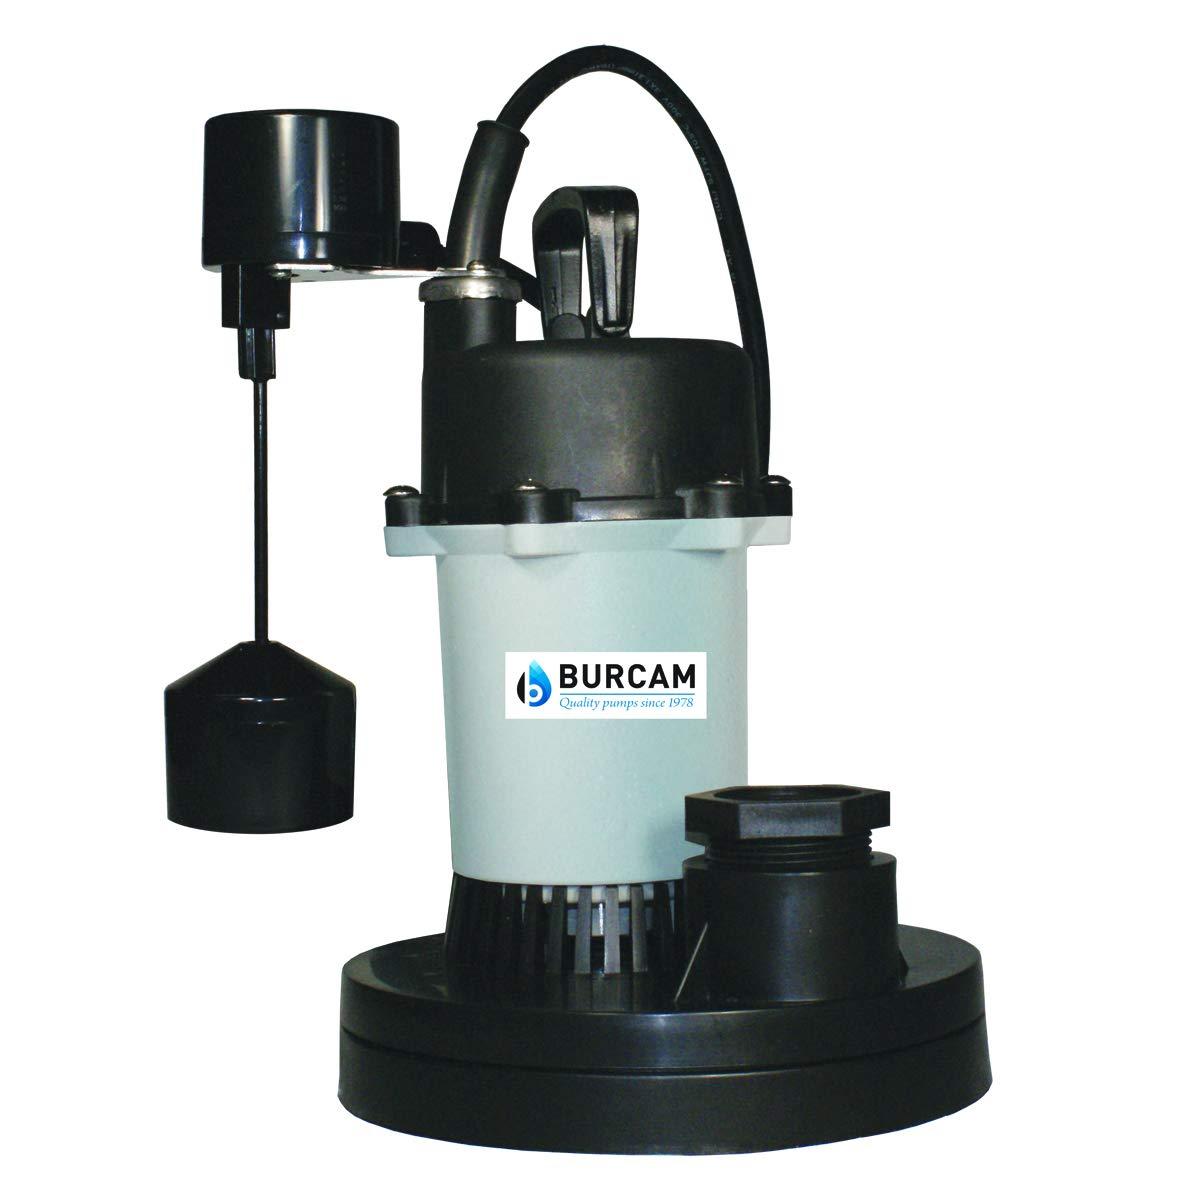 BURCAM 300610Z 1/3 HP Zinc Submersible Sump Pump